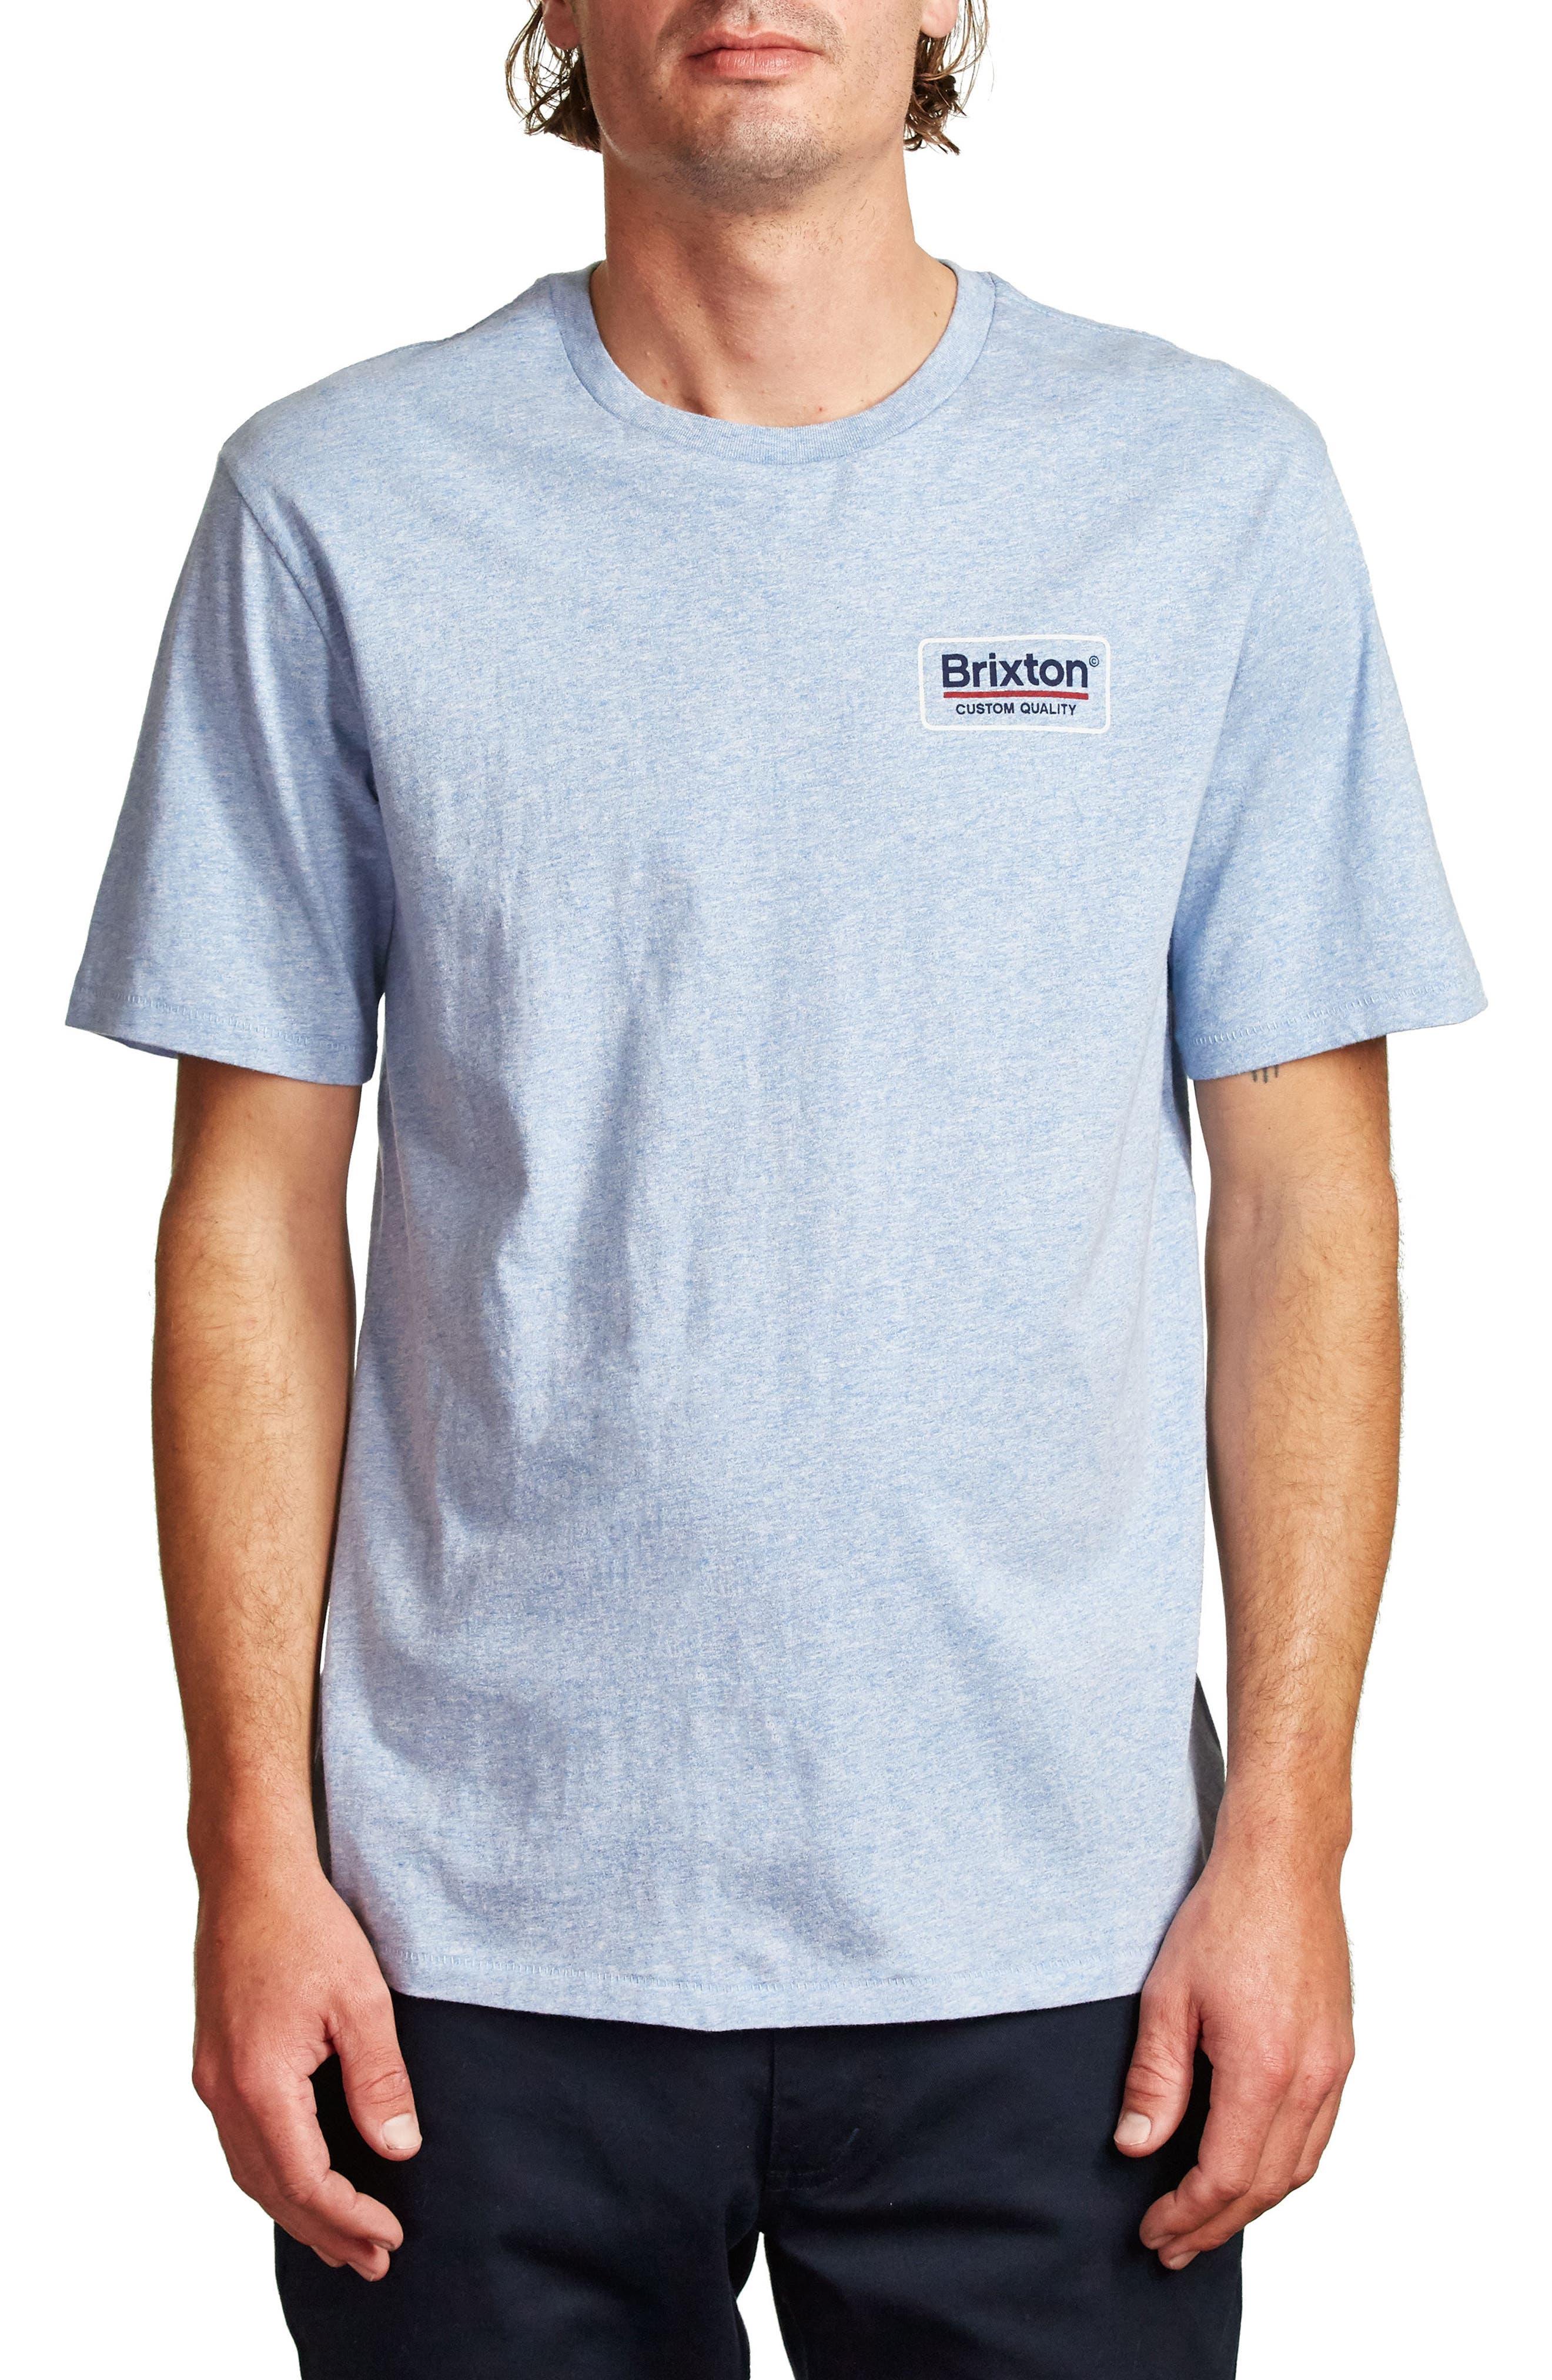 Brixton Palm Premium T-Shirt